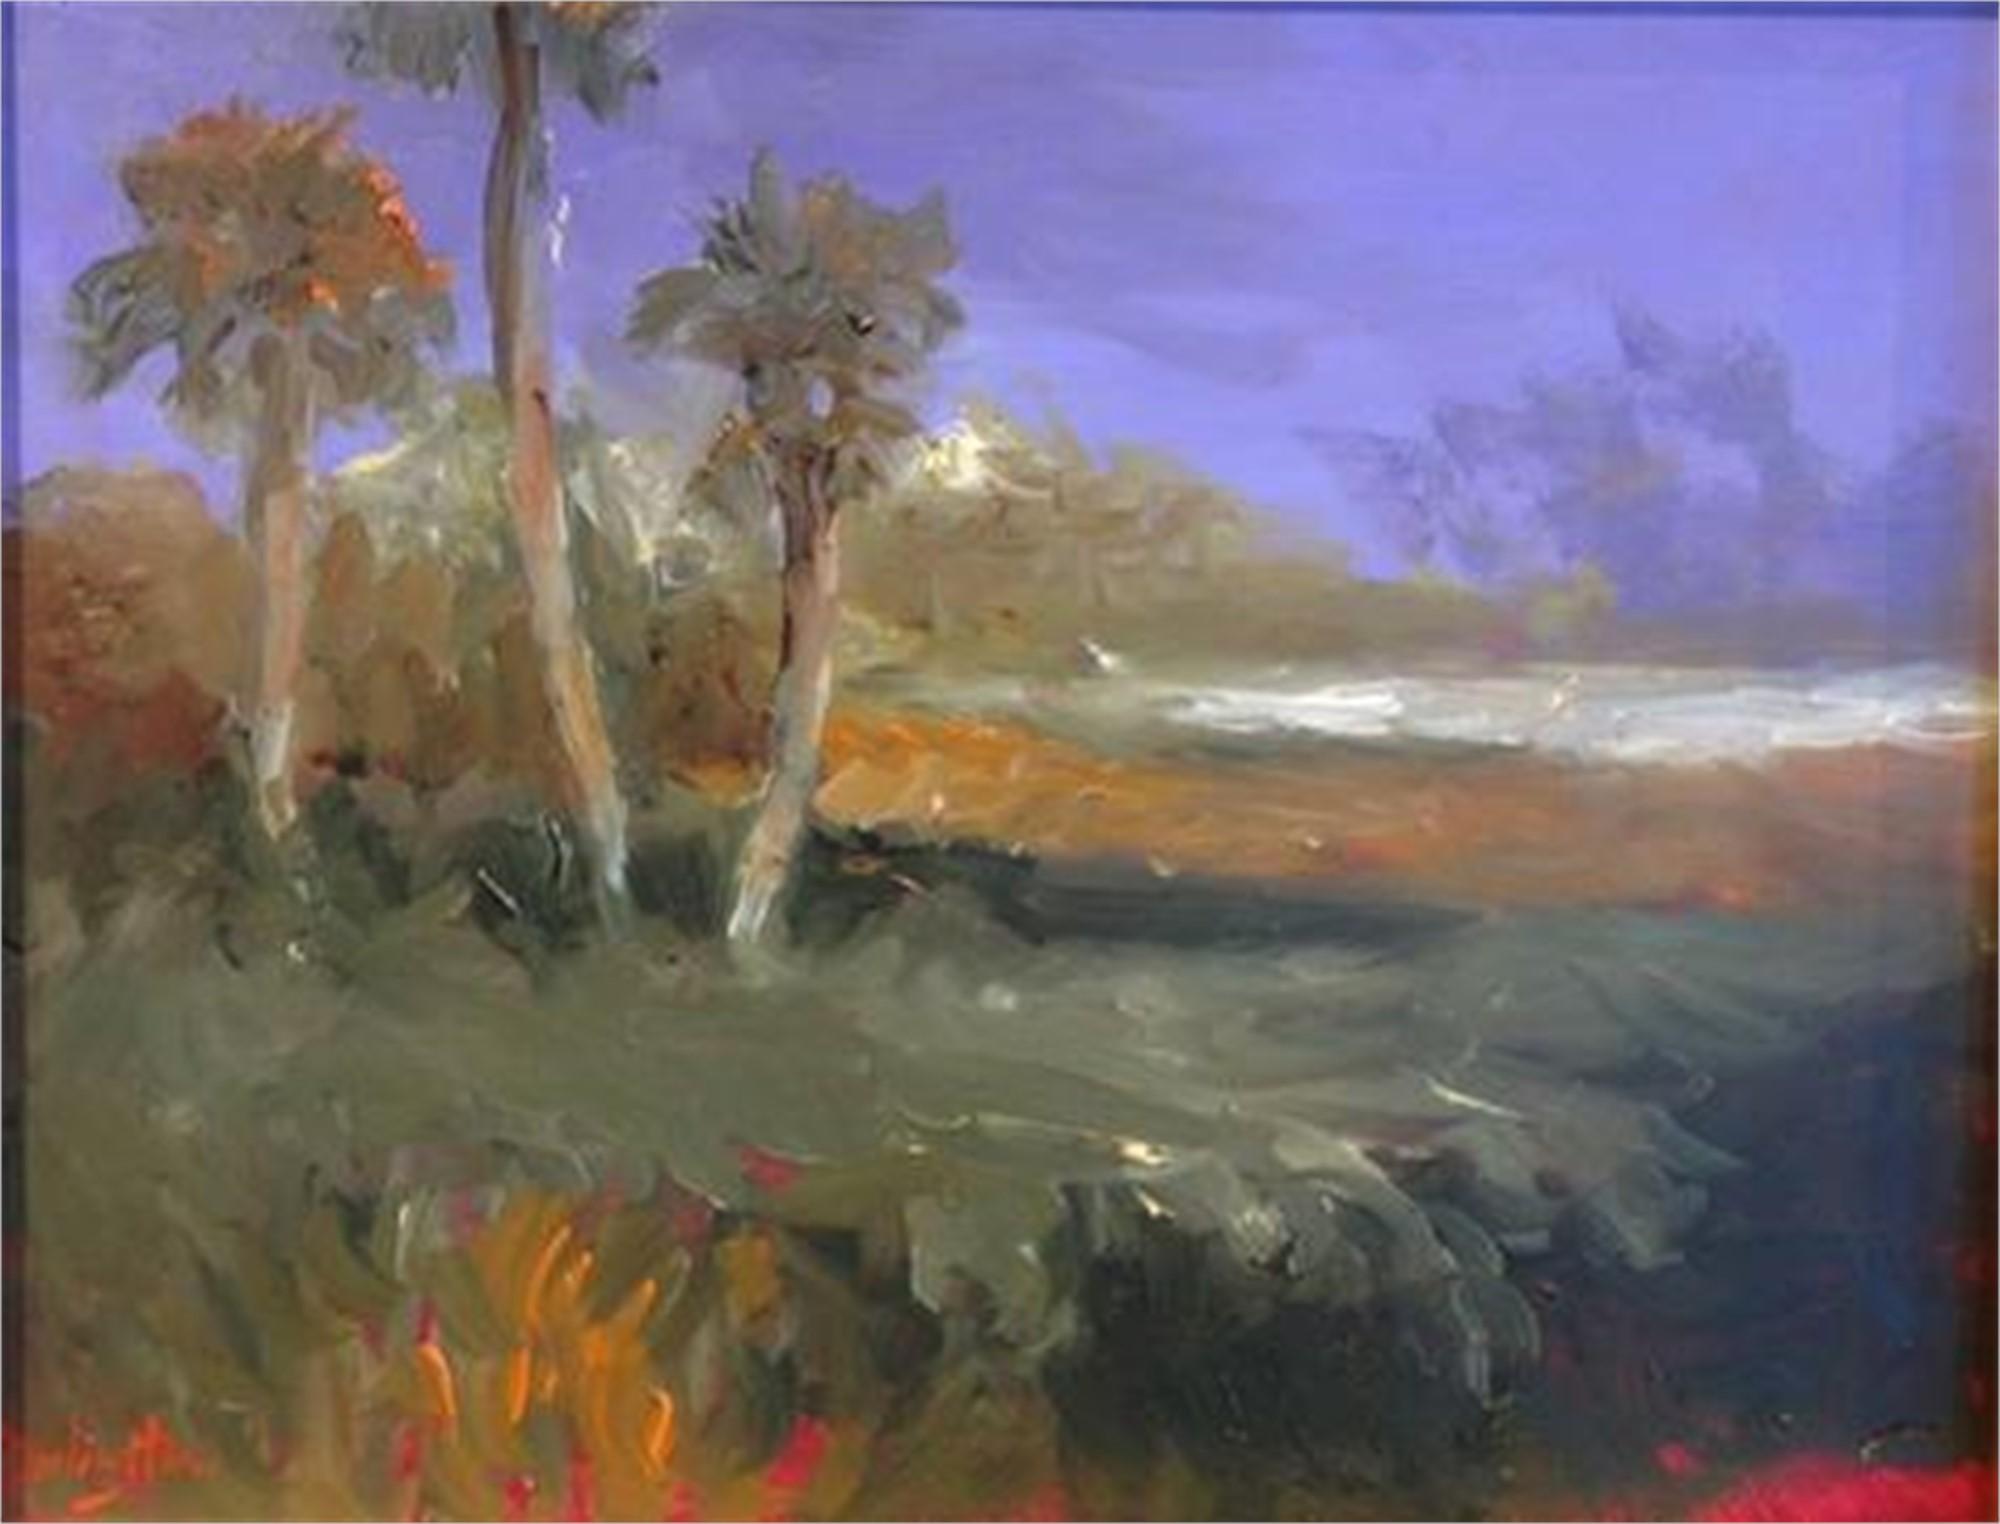 Evening Palmettos II by Jim Darlington